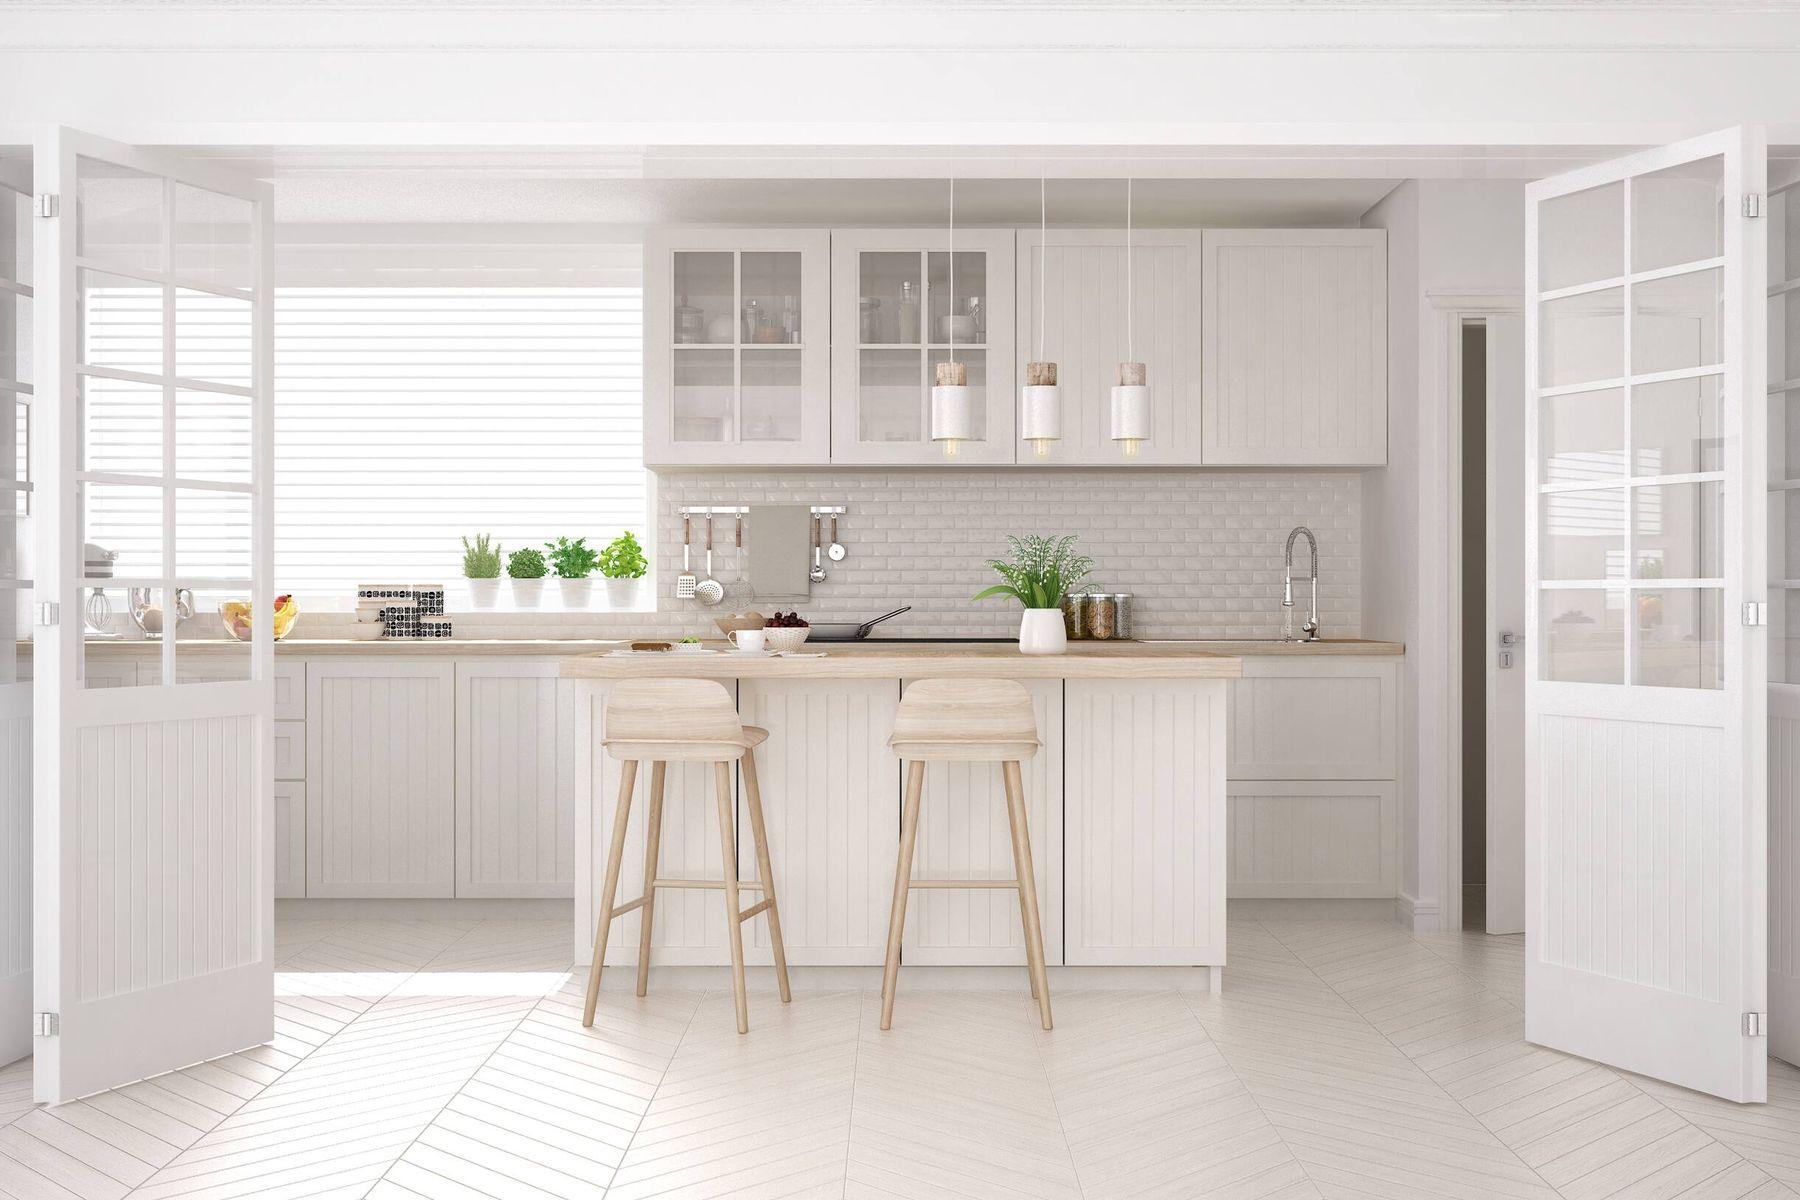 Tips Manajemen untuk Ciptakan Dapur Bersih Minimalis